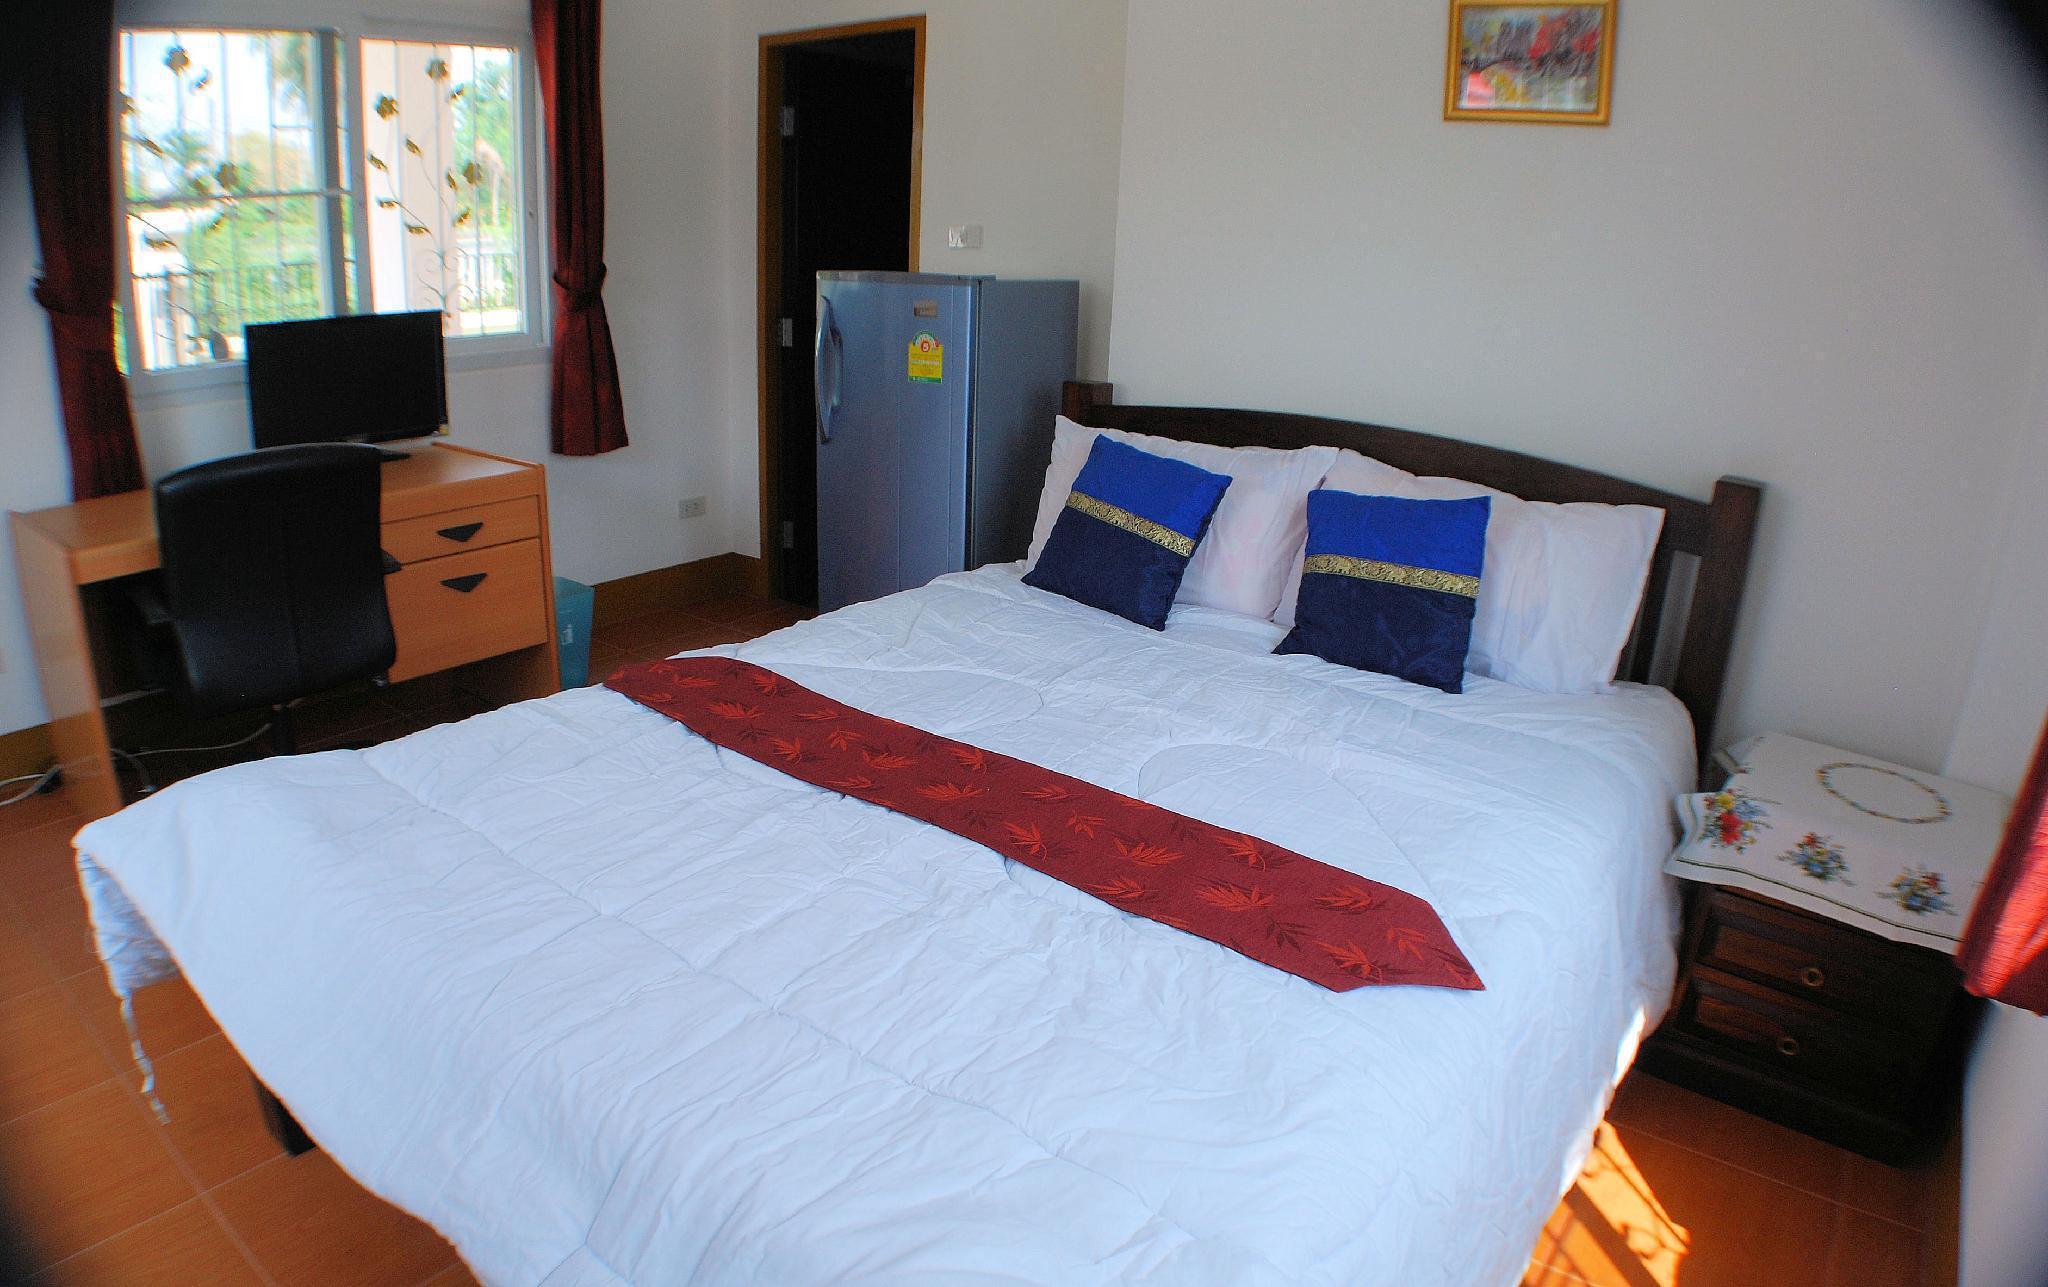 Serviced Luxury Apartment in Gated Community สตูดิโอ อพาร์ตเมนต์ 1 ห้องน้ำส่วนตัว ขนาด 24 ตร.ม. – หางดง